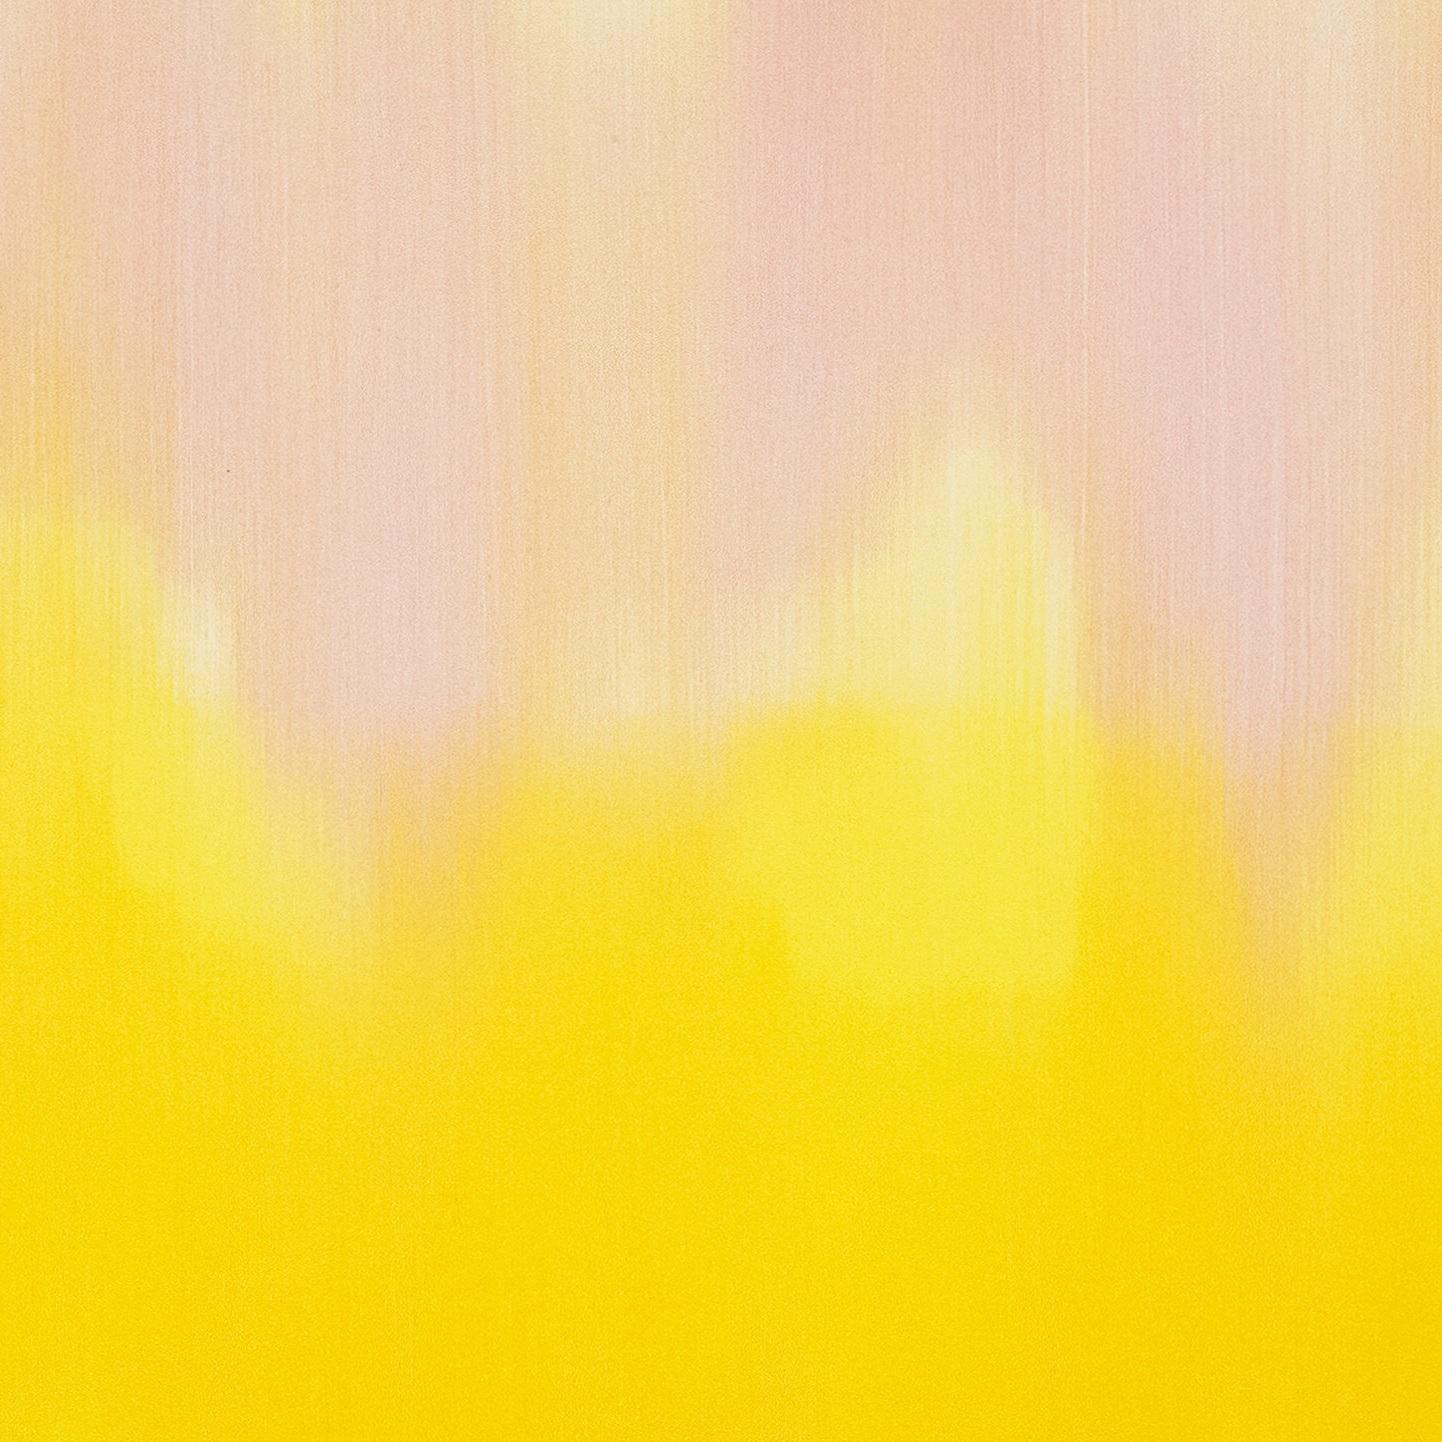 8.yellow1v2.jpg